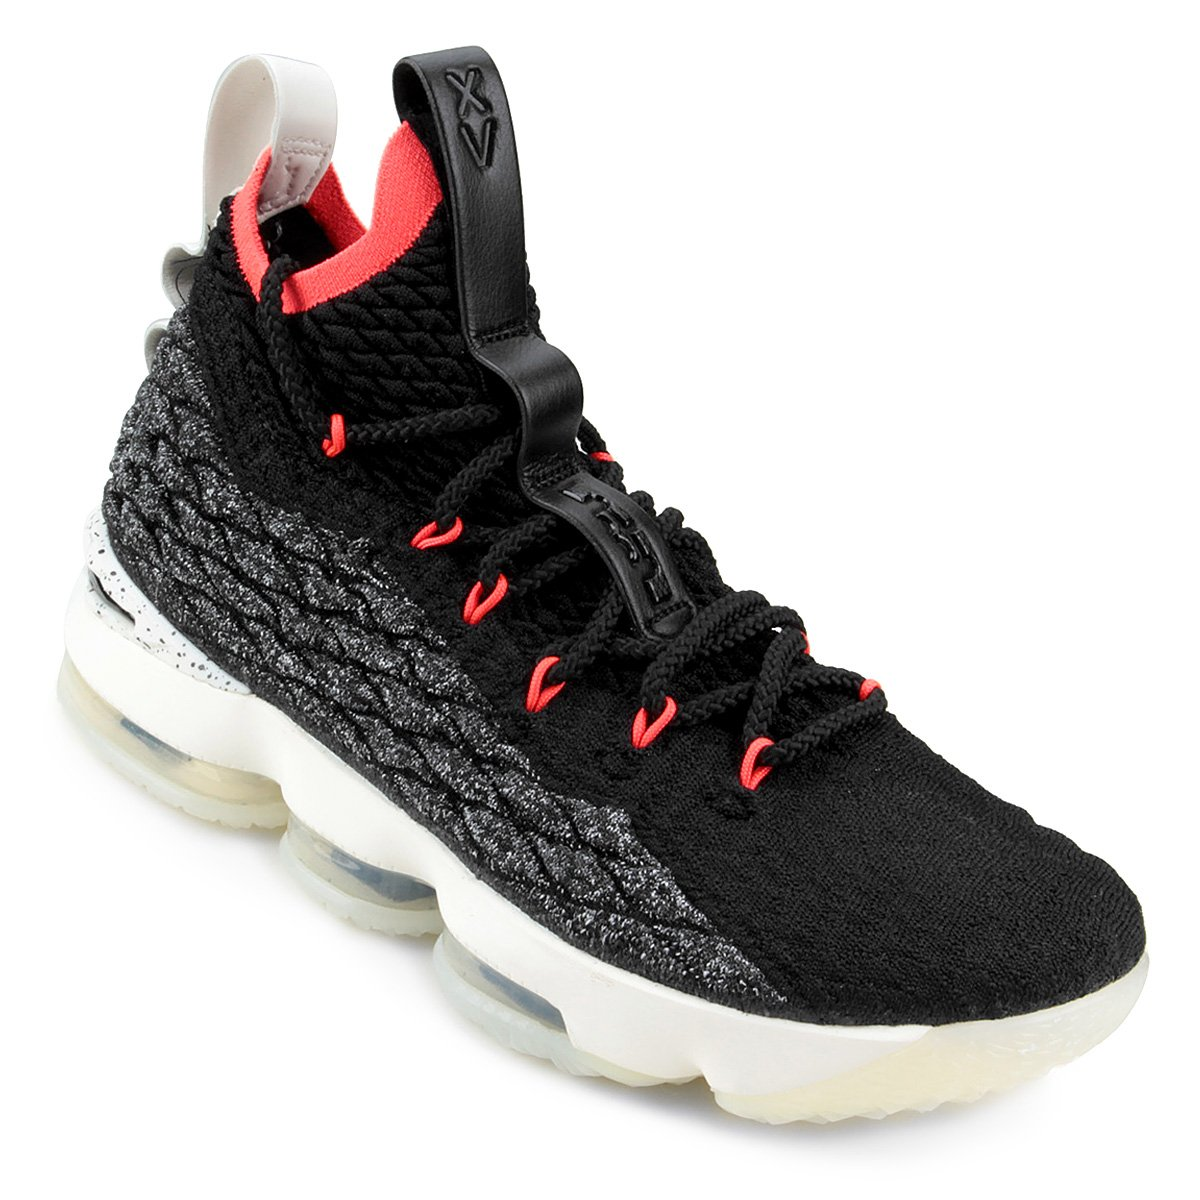 online retailer 0719b 492b9 Tênis Nike Lebron XV Machine 61 Masculino | Loja NBA